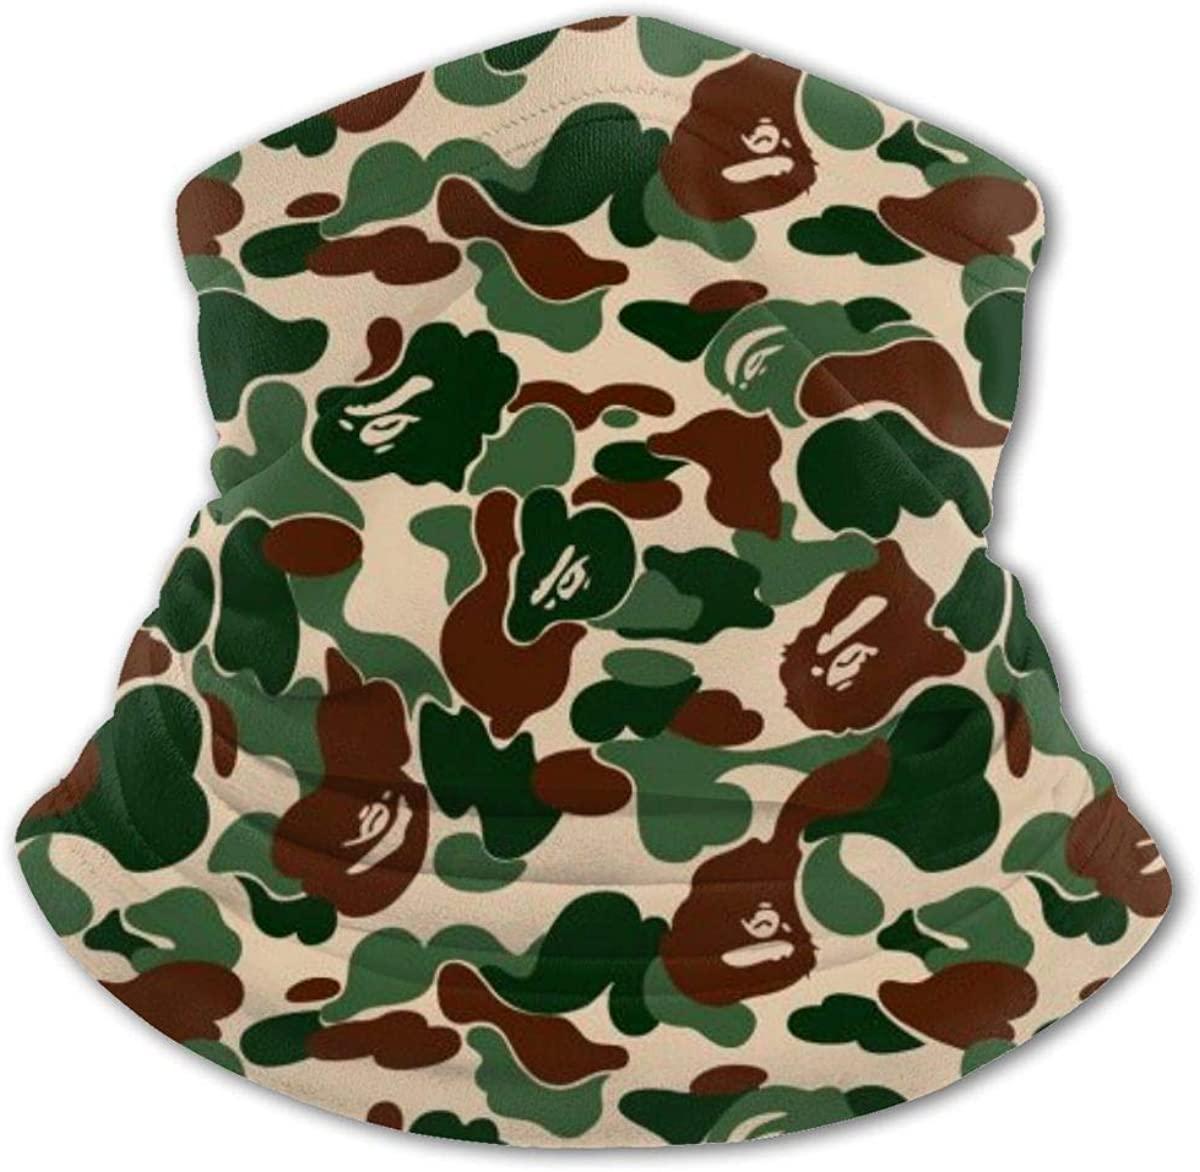 Aniamlcamouflage Green Headwear For Girls And Boys, Head Wrap, Neck Gaiter, Headband, Tenn Fishing Mask, Magic Scarf, Tube Mask, Face Bandana Mask For Camping Running Cycling